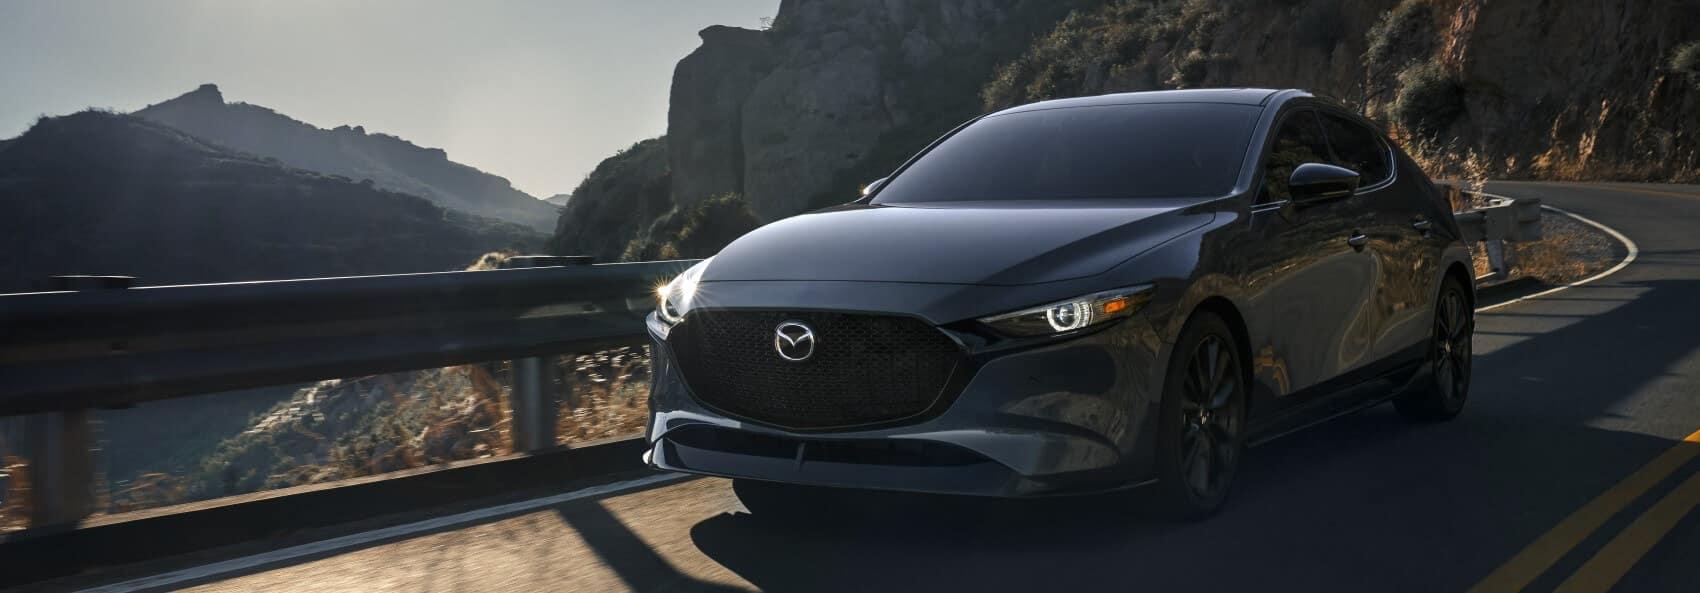 Mazda Vehicle Inspections